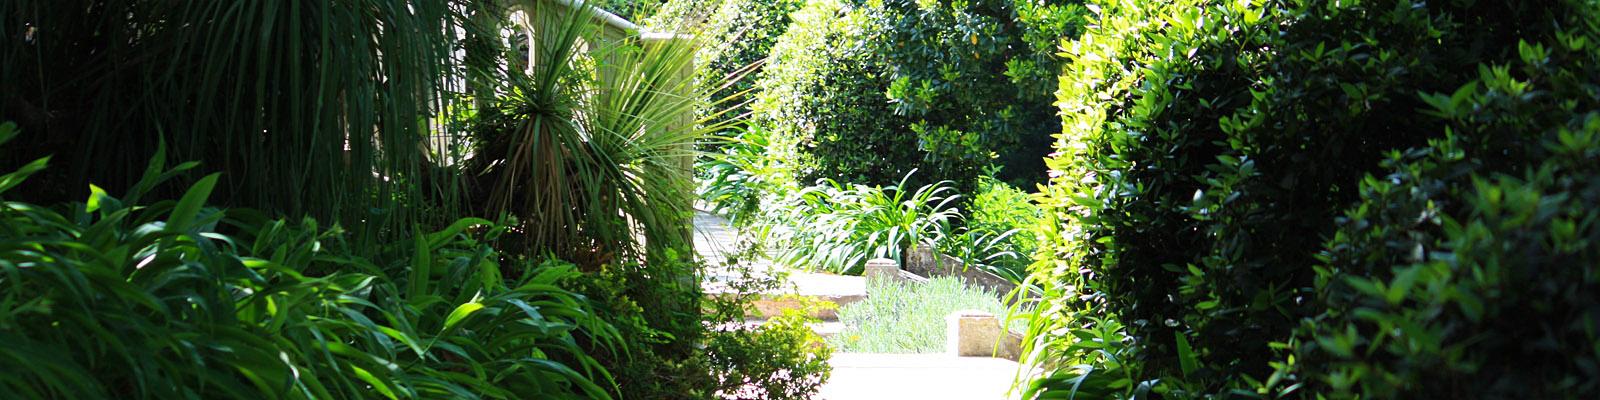 Green Parrot Gardens | Blog | Garden Investments